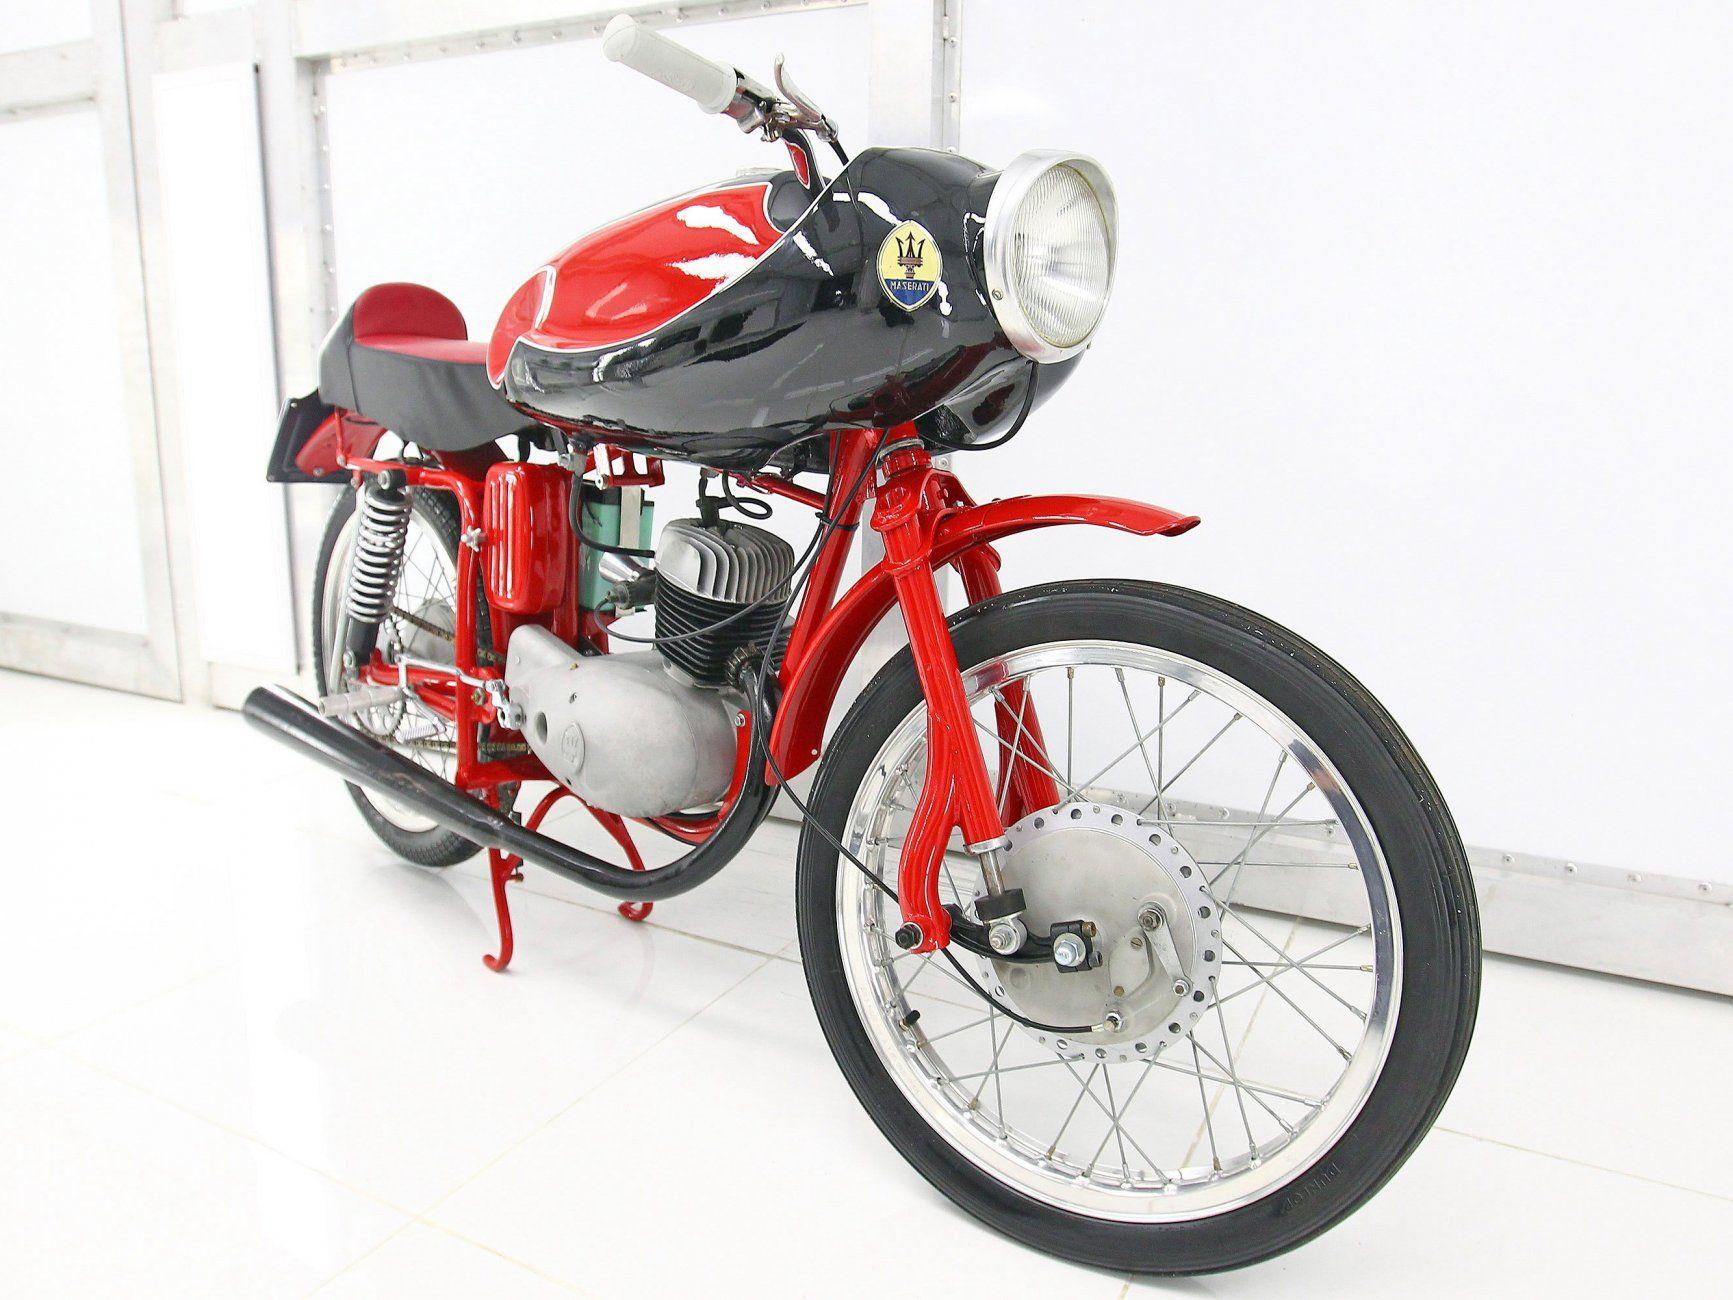 s lection de motos cafe racer moto scooter marseille occasion moto. Black Bedroom Furniture Sets. Home Design Ideas